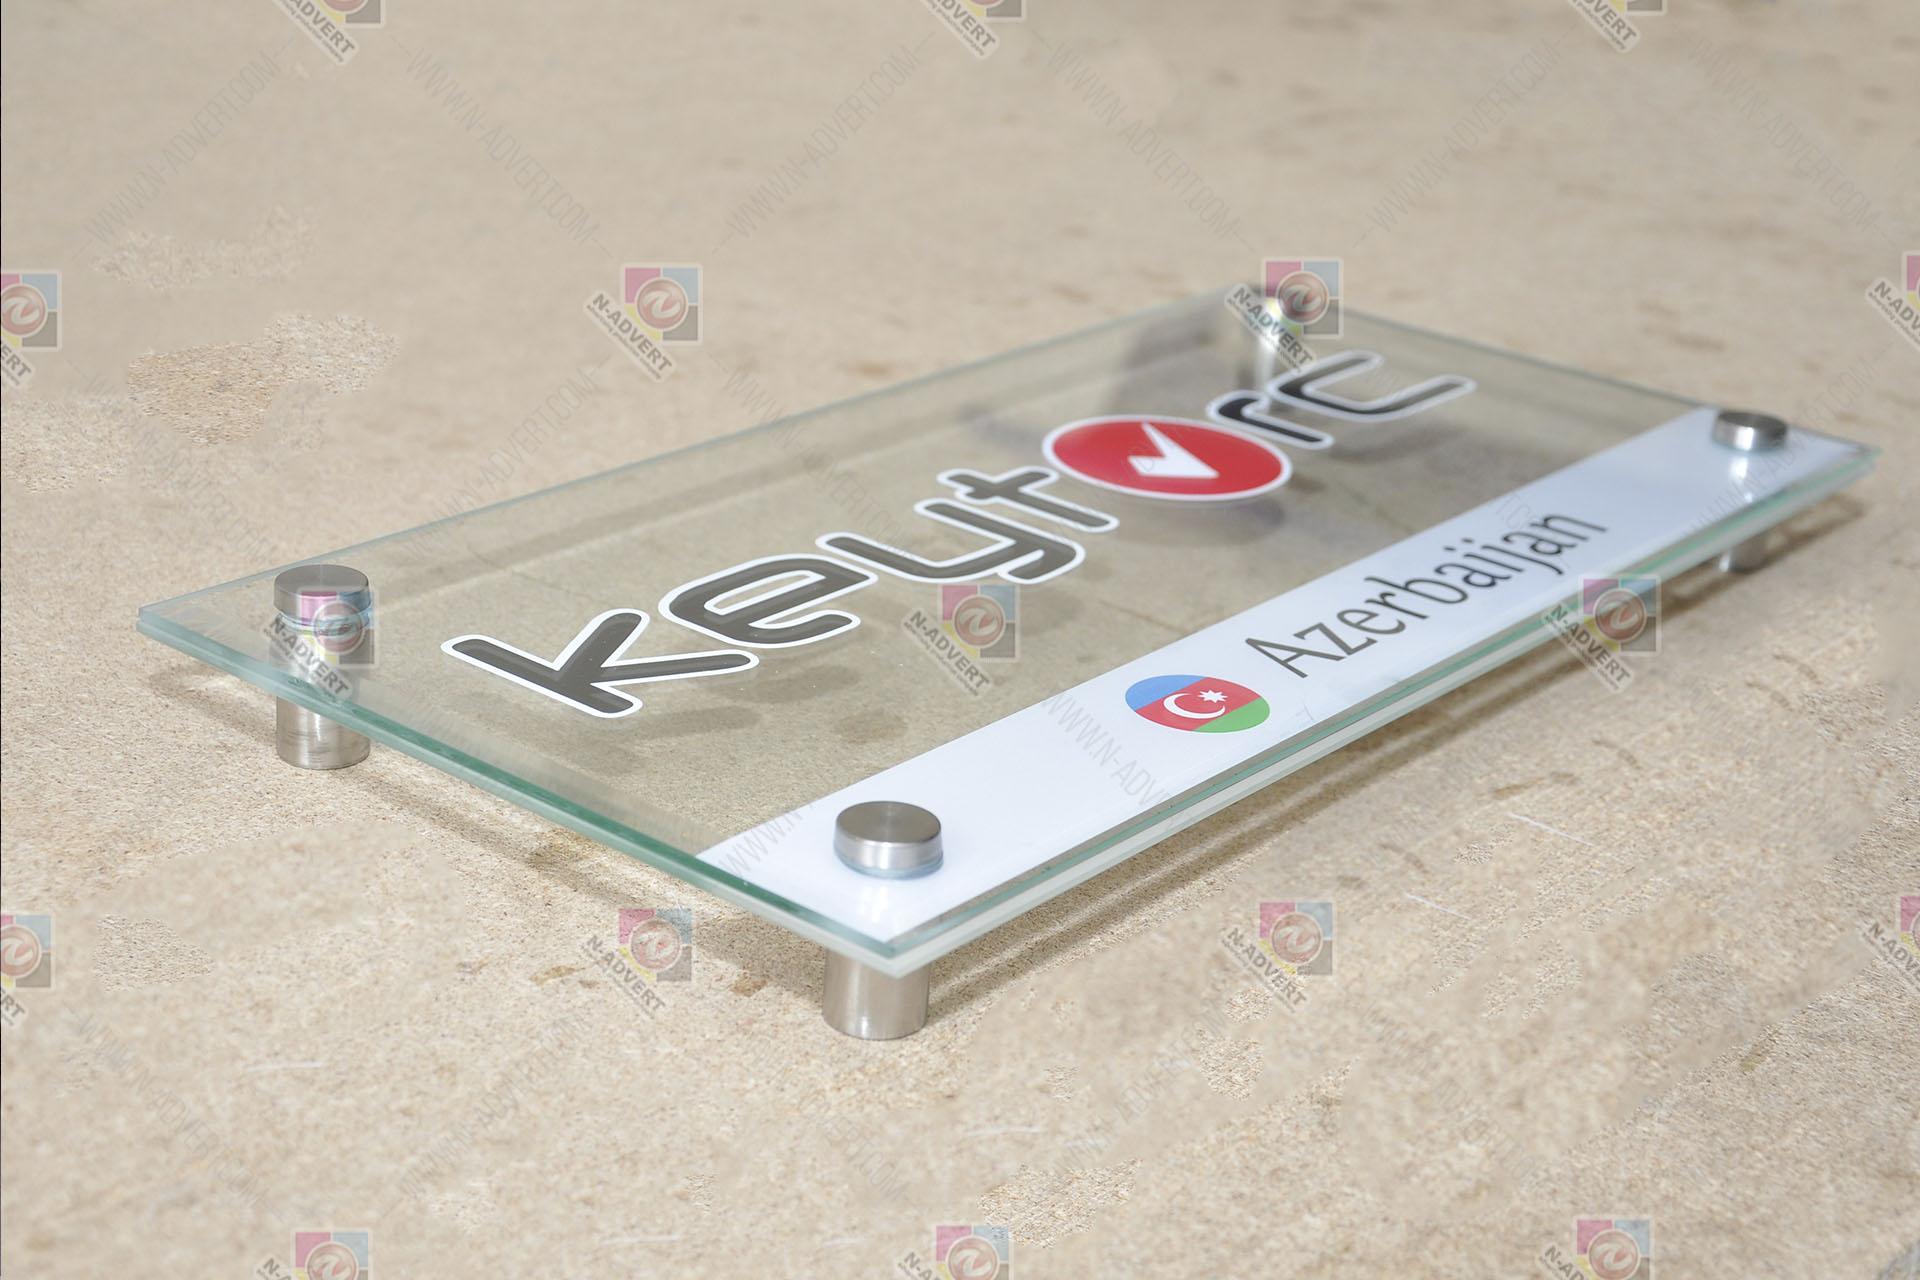 Keytorc 1920x1280